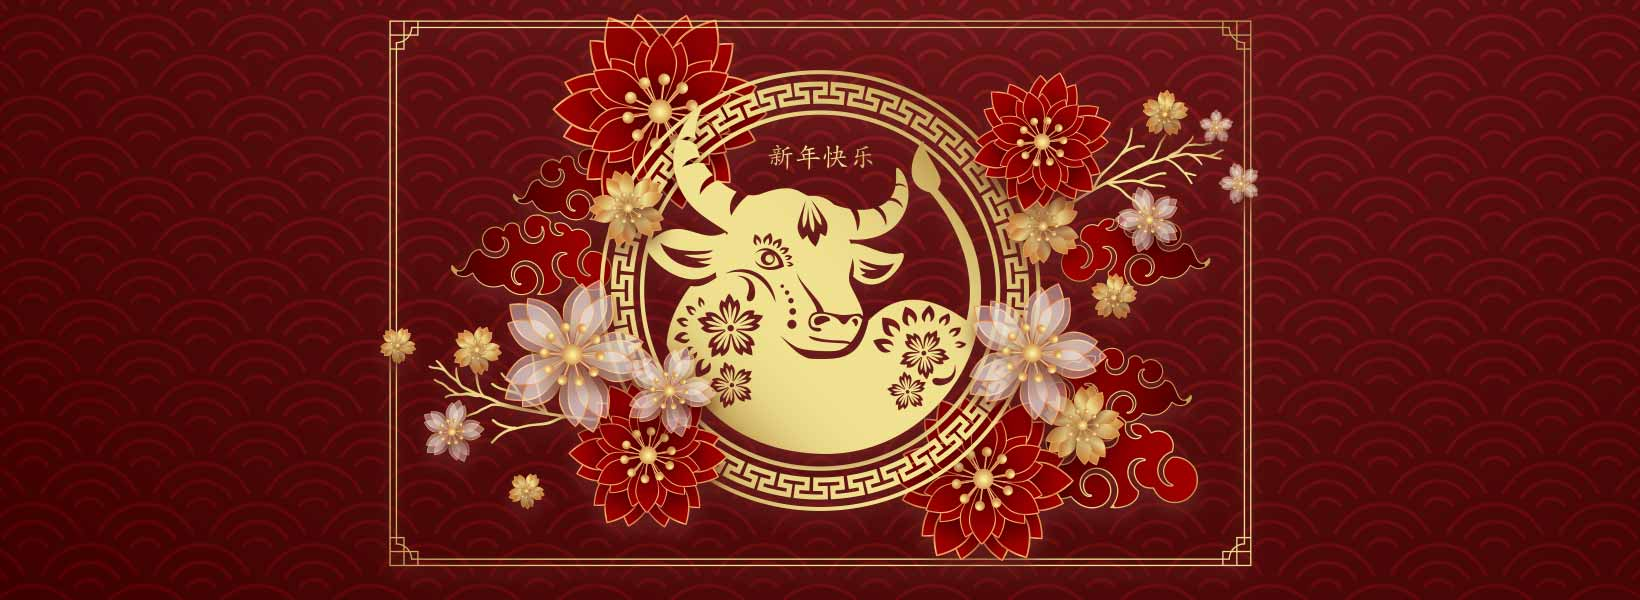 anul nou chinezesc 2021